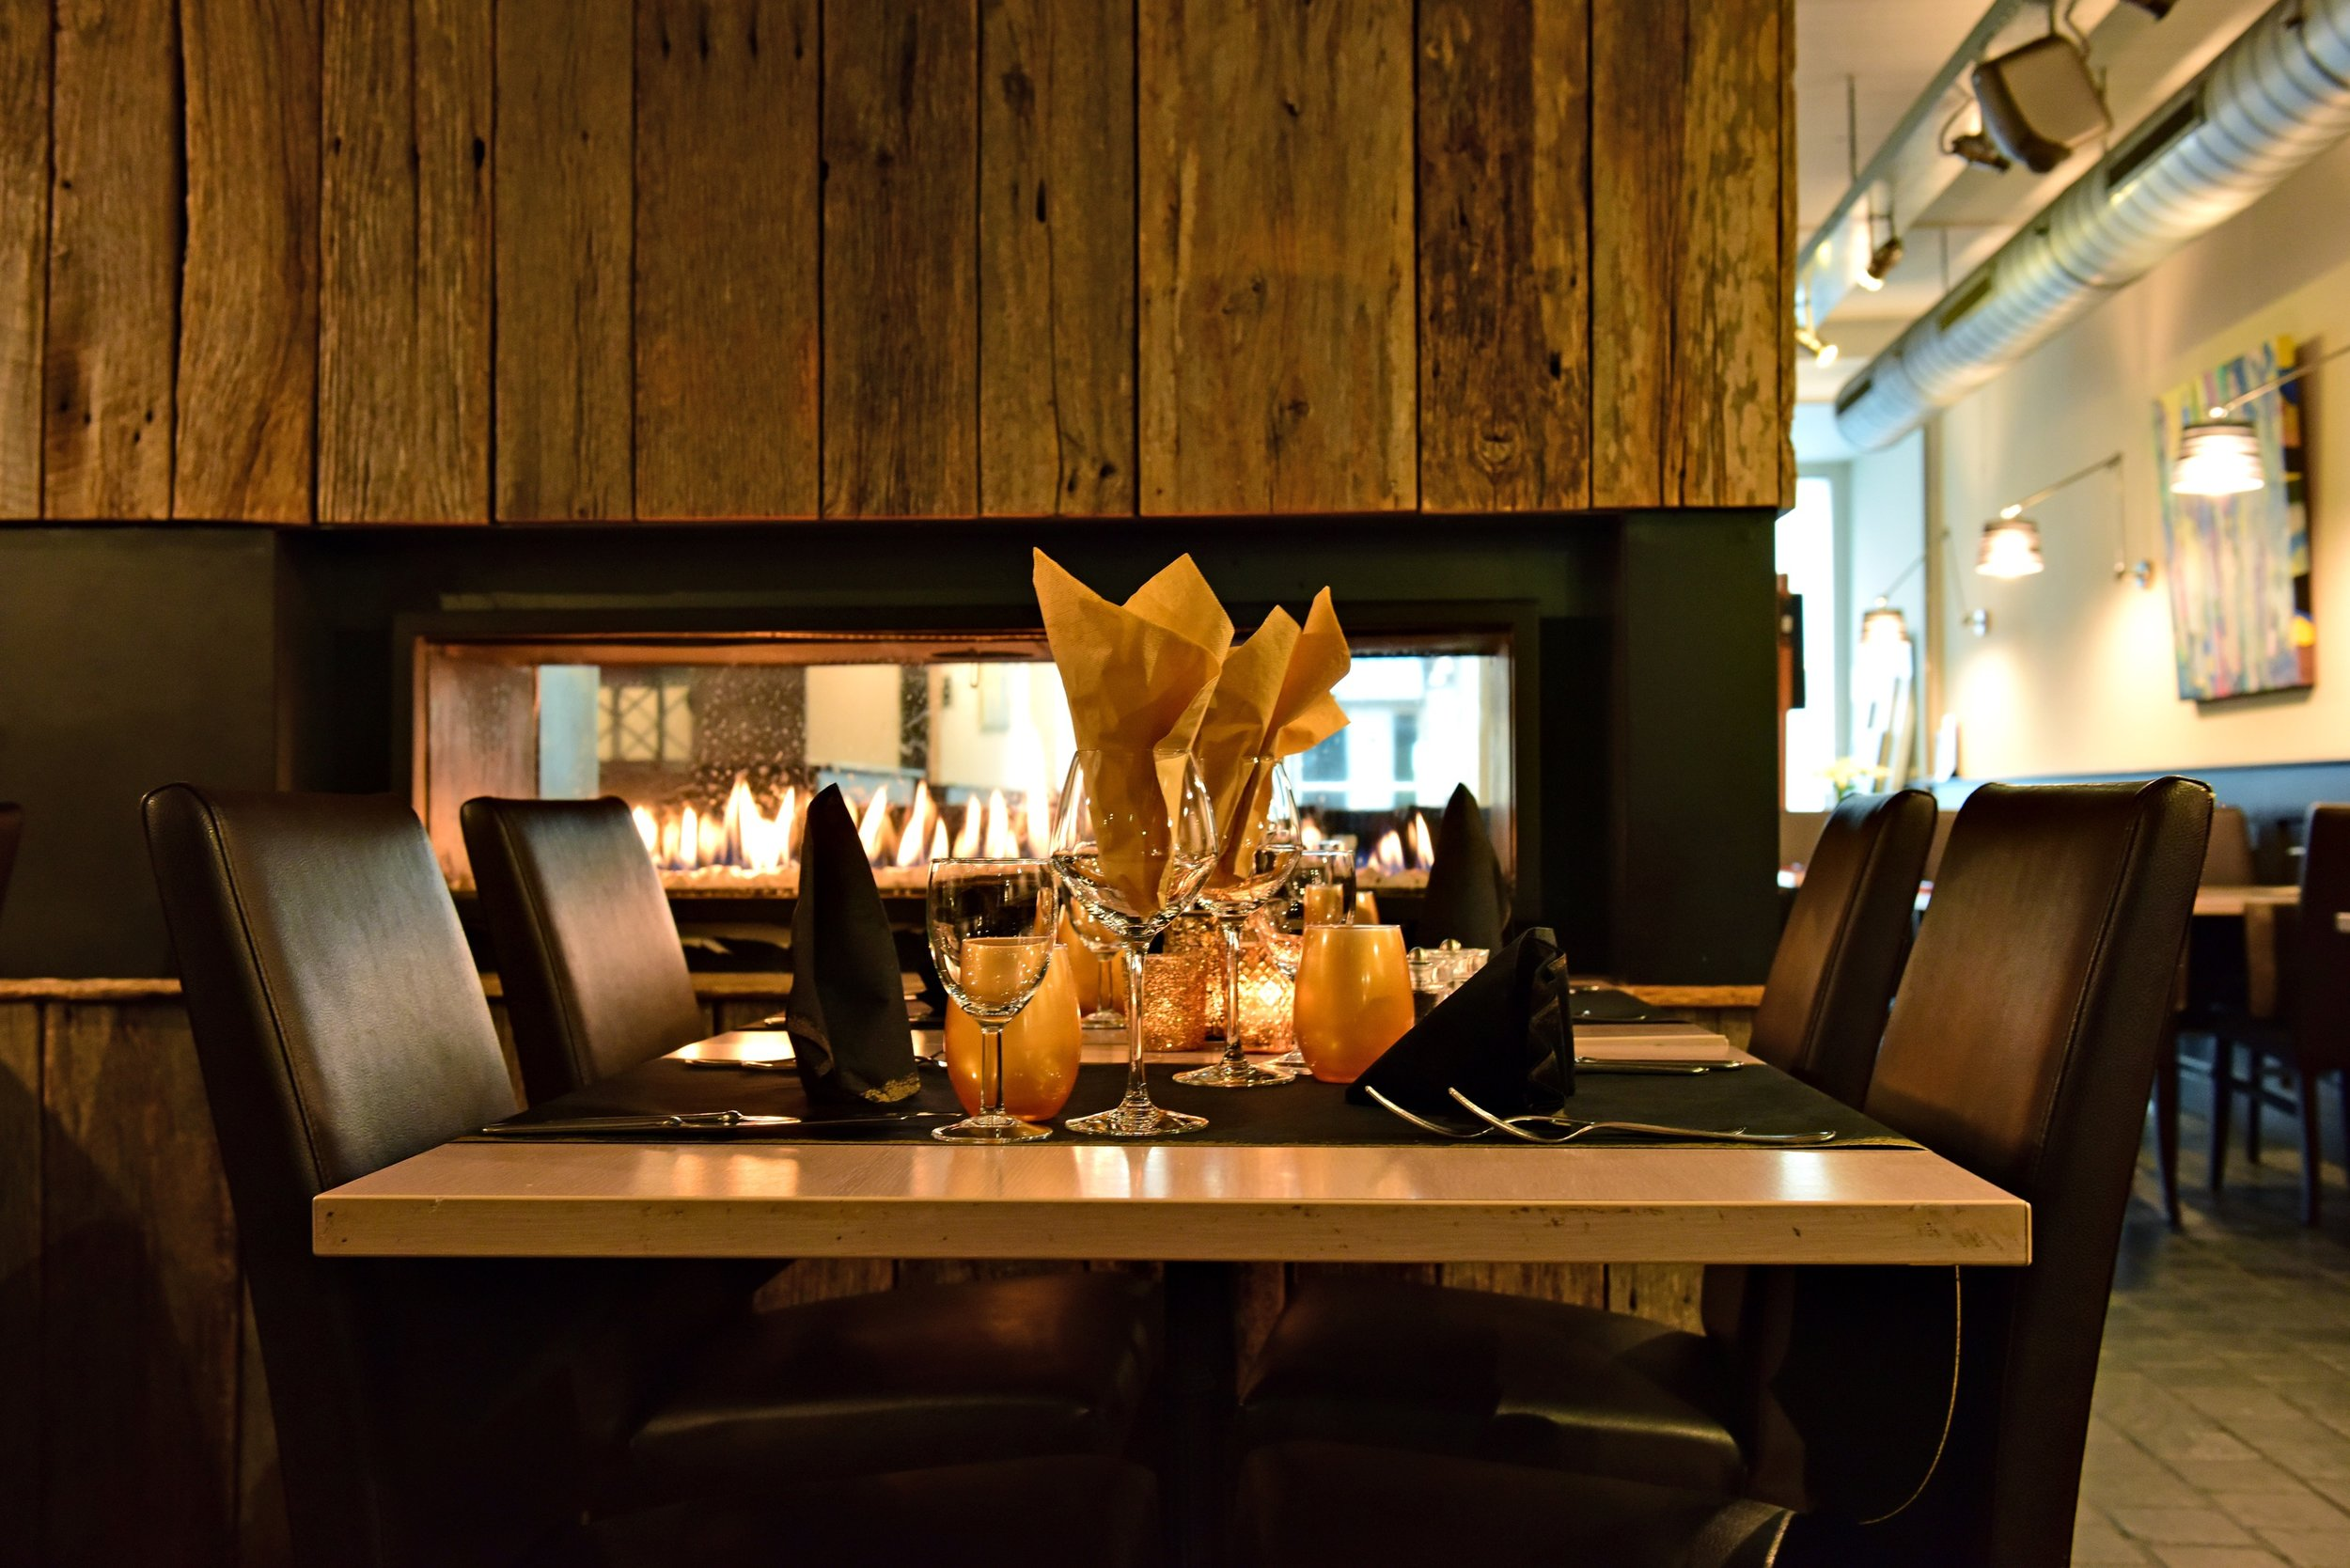 5 restuarant brasserie t filet purreke pureke aalst steak pur tablefever .jpg